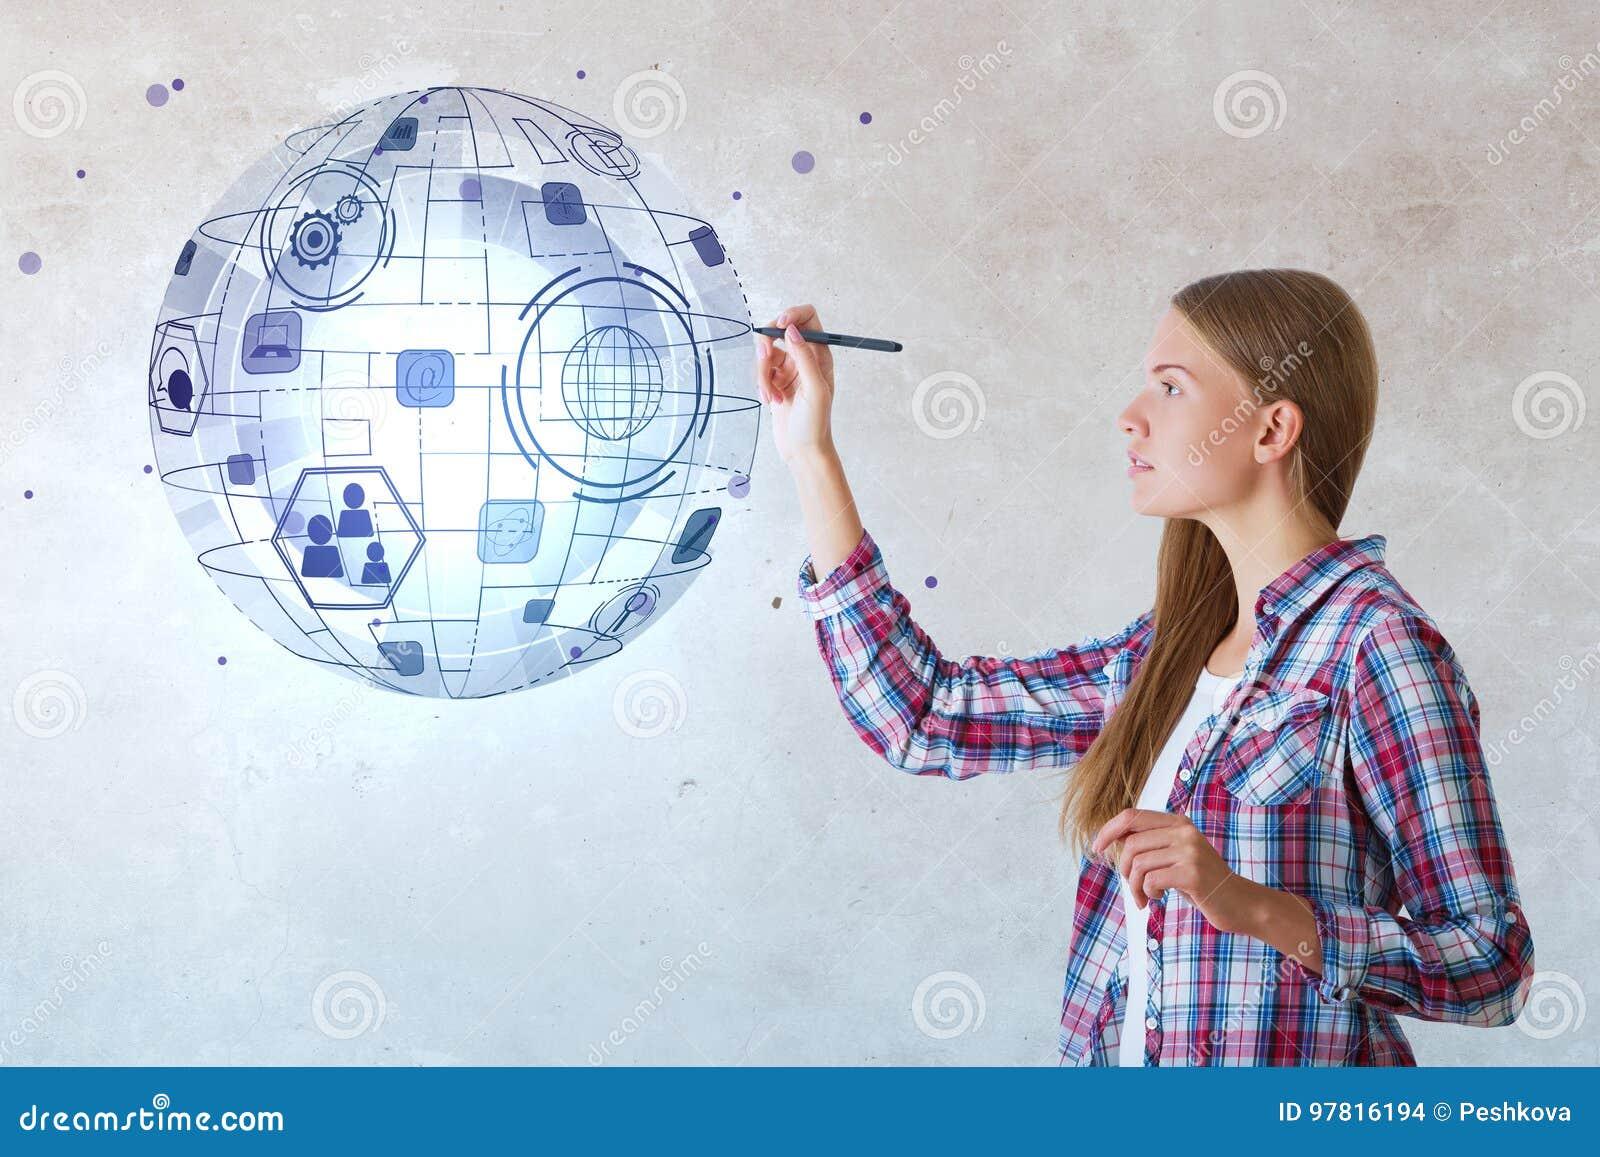 Technologie en innovatieconcept